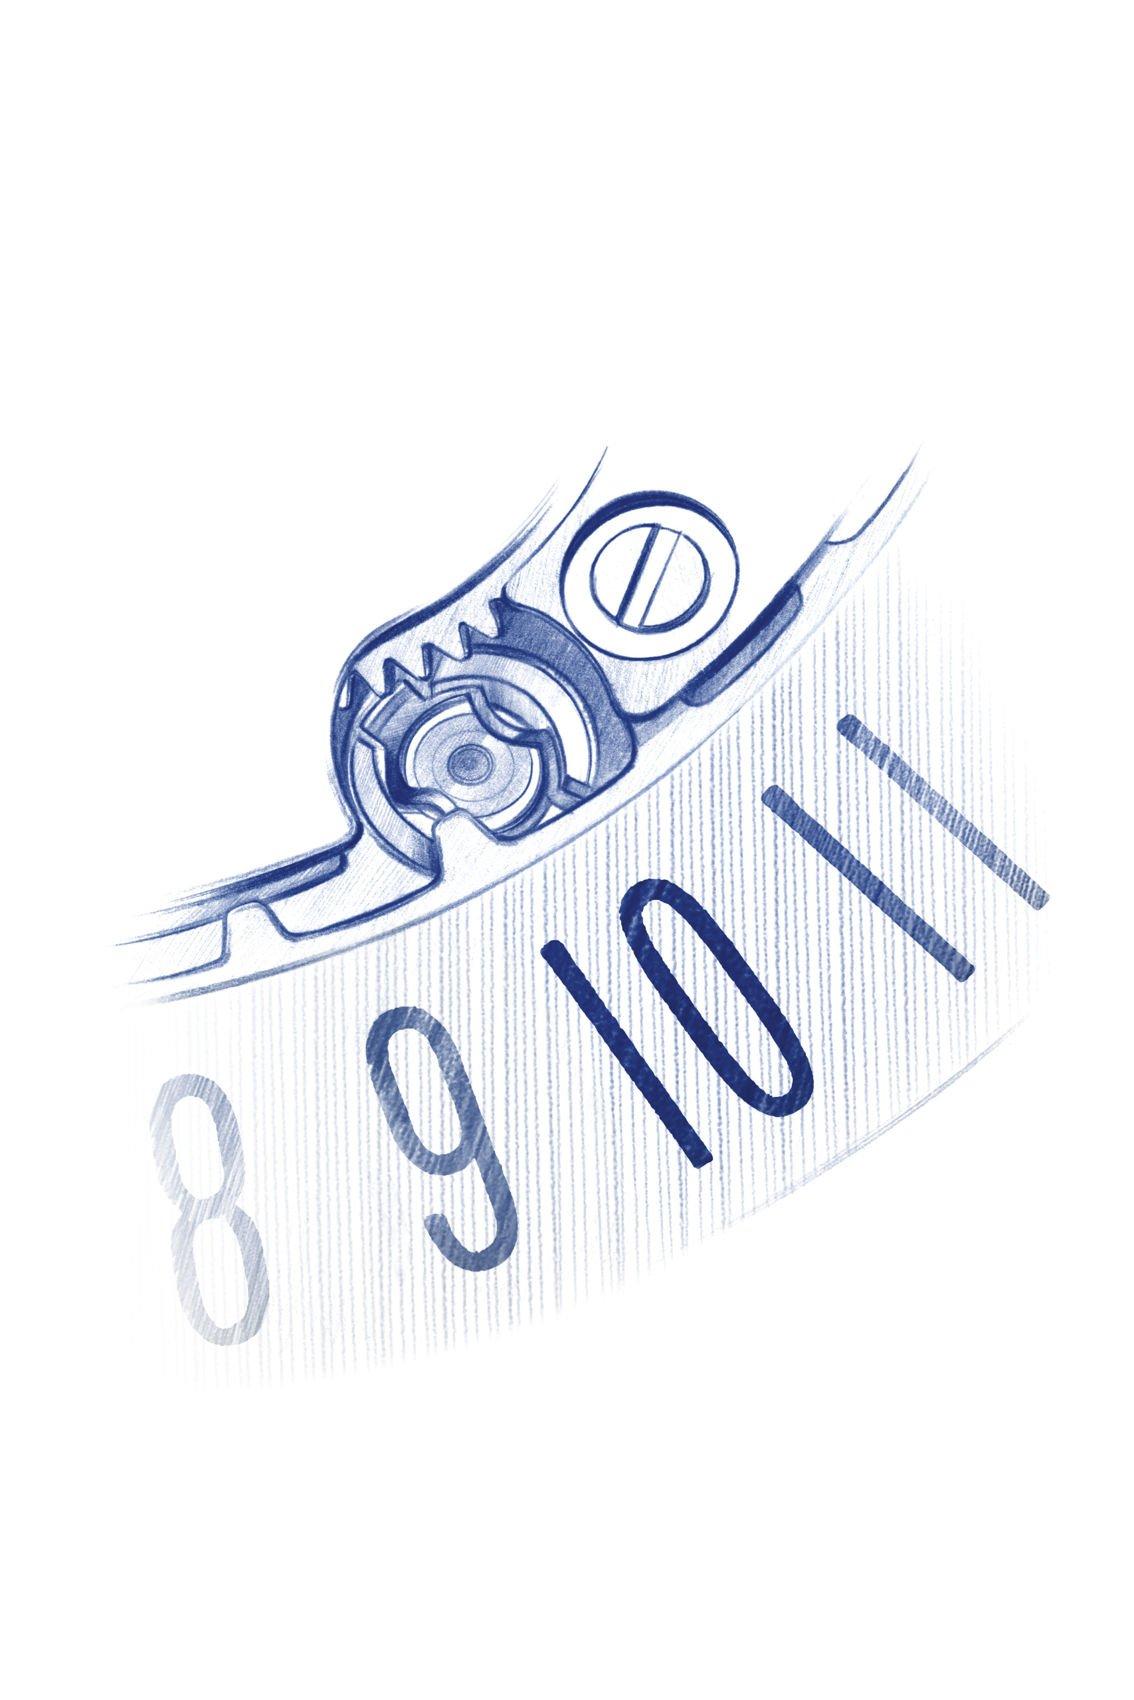 Oris movement Calibre 400_HighRes_12695